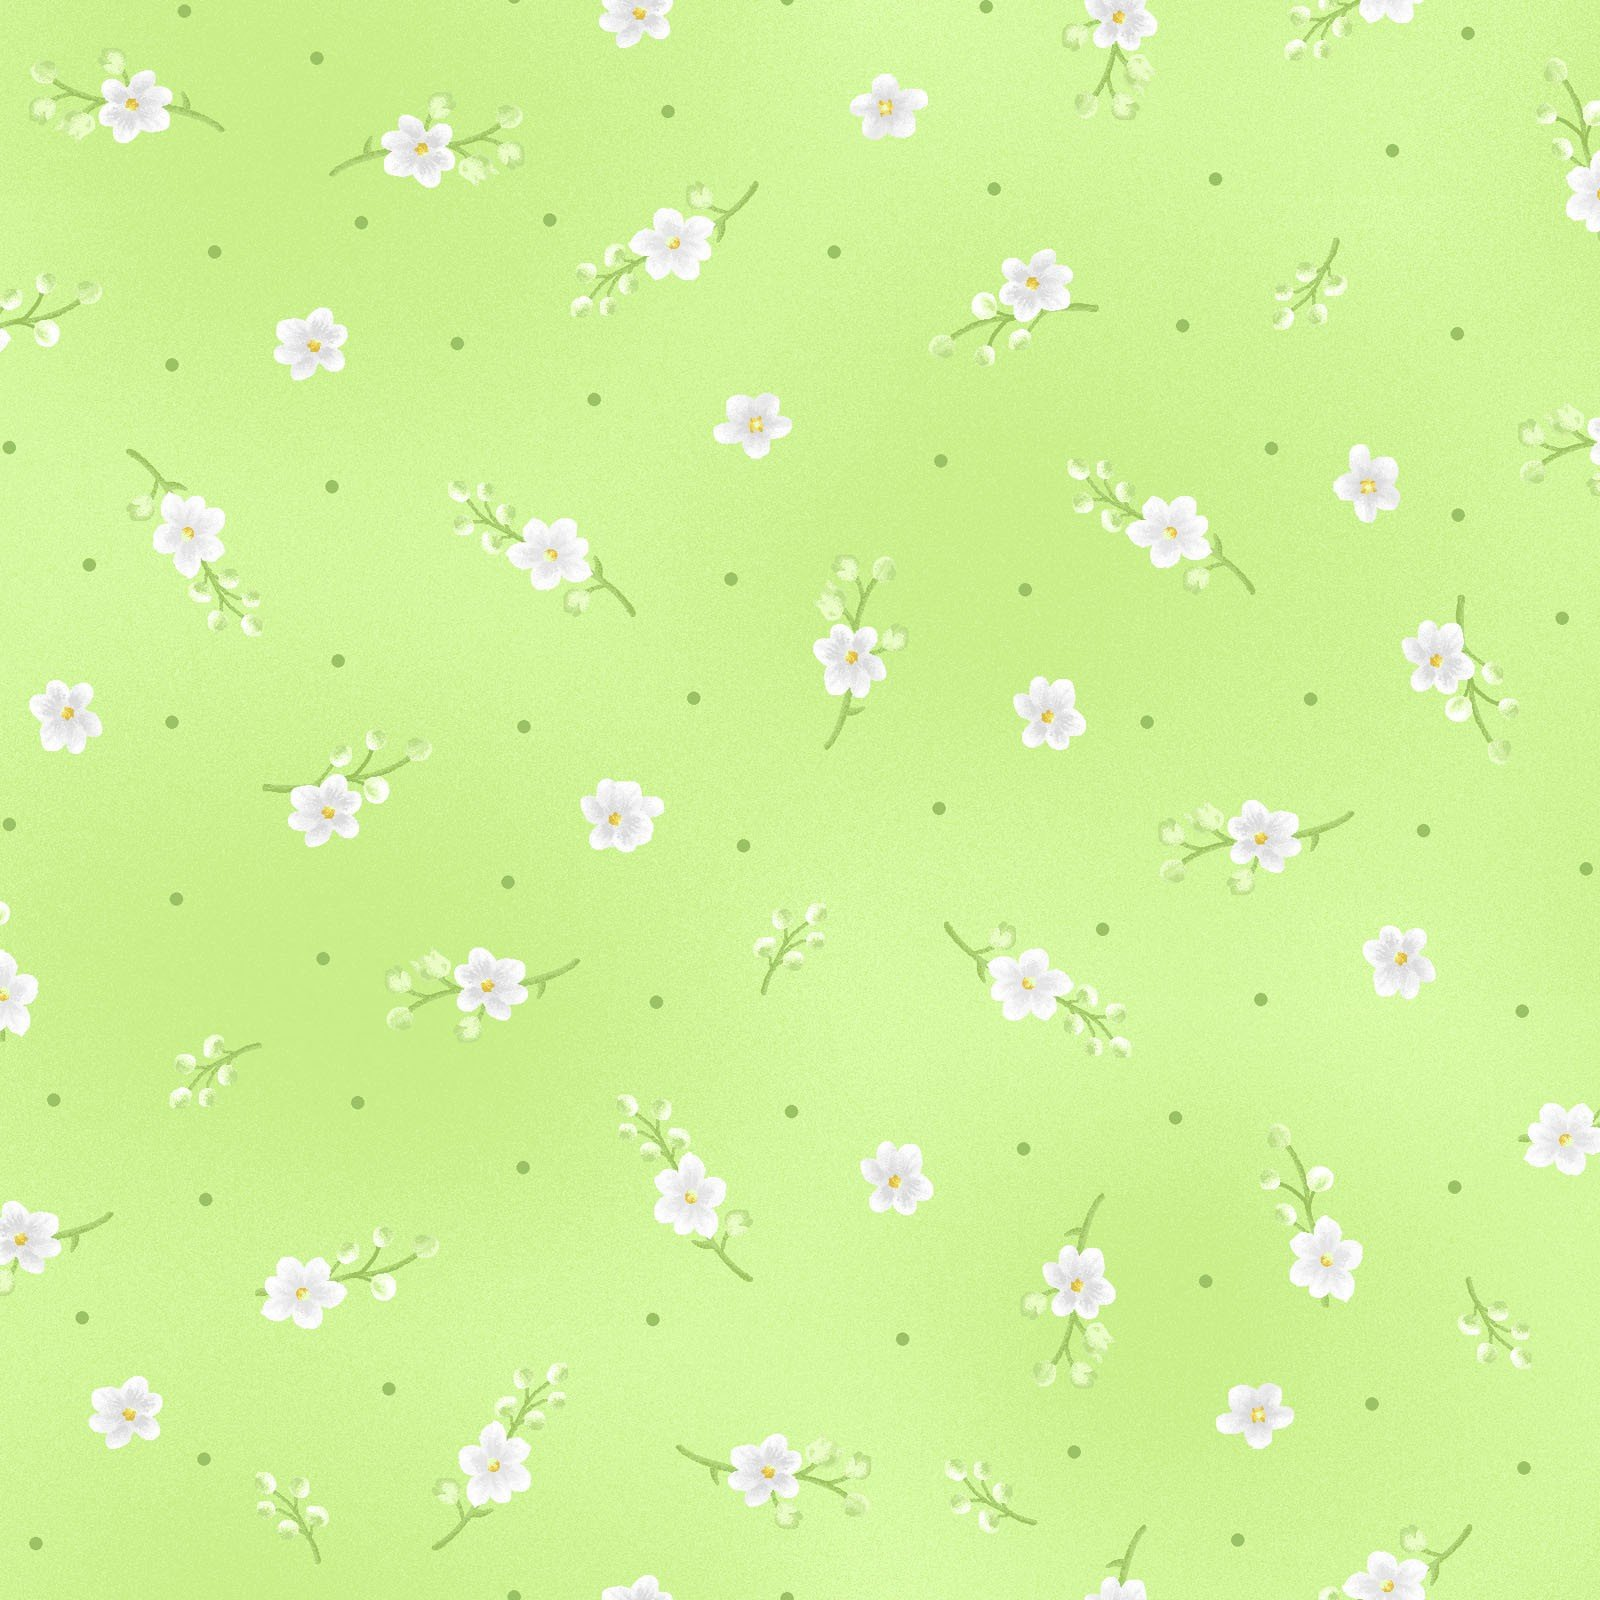 Lily Buds - Green<br/>Maywood Studio 8292-G